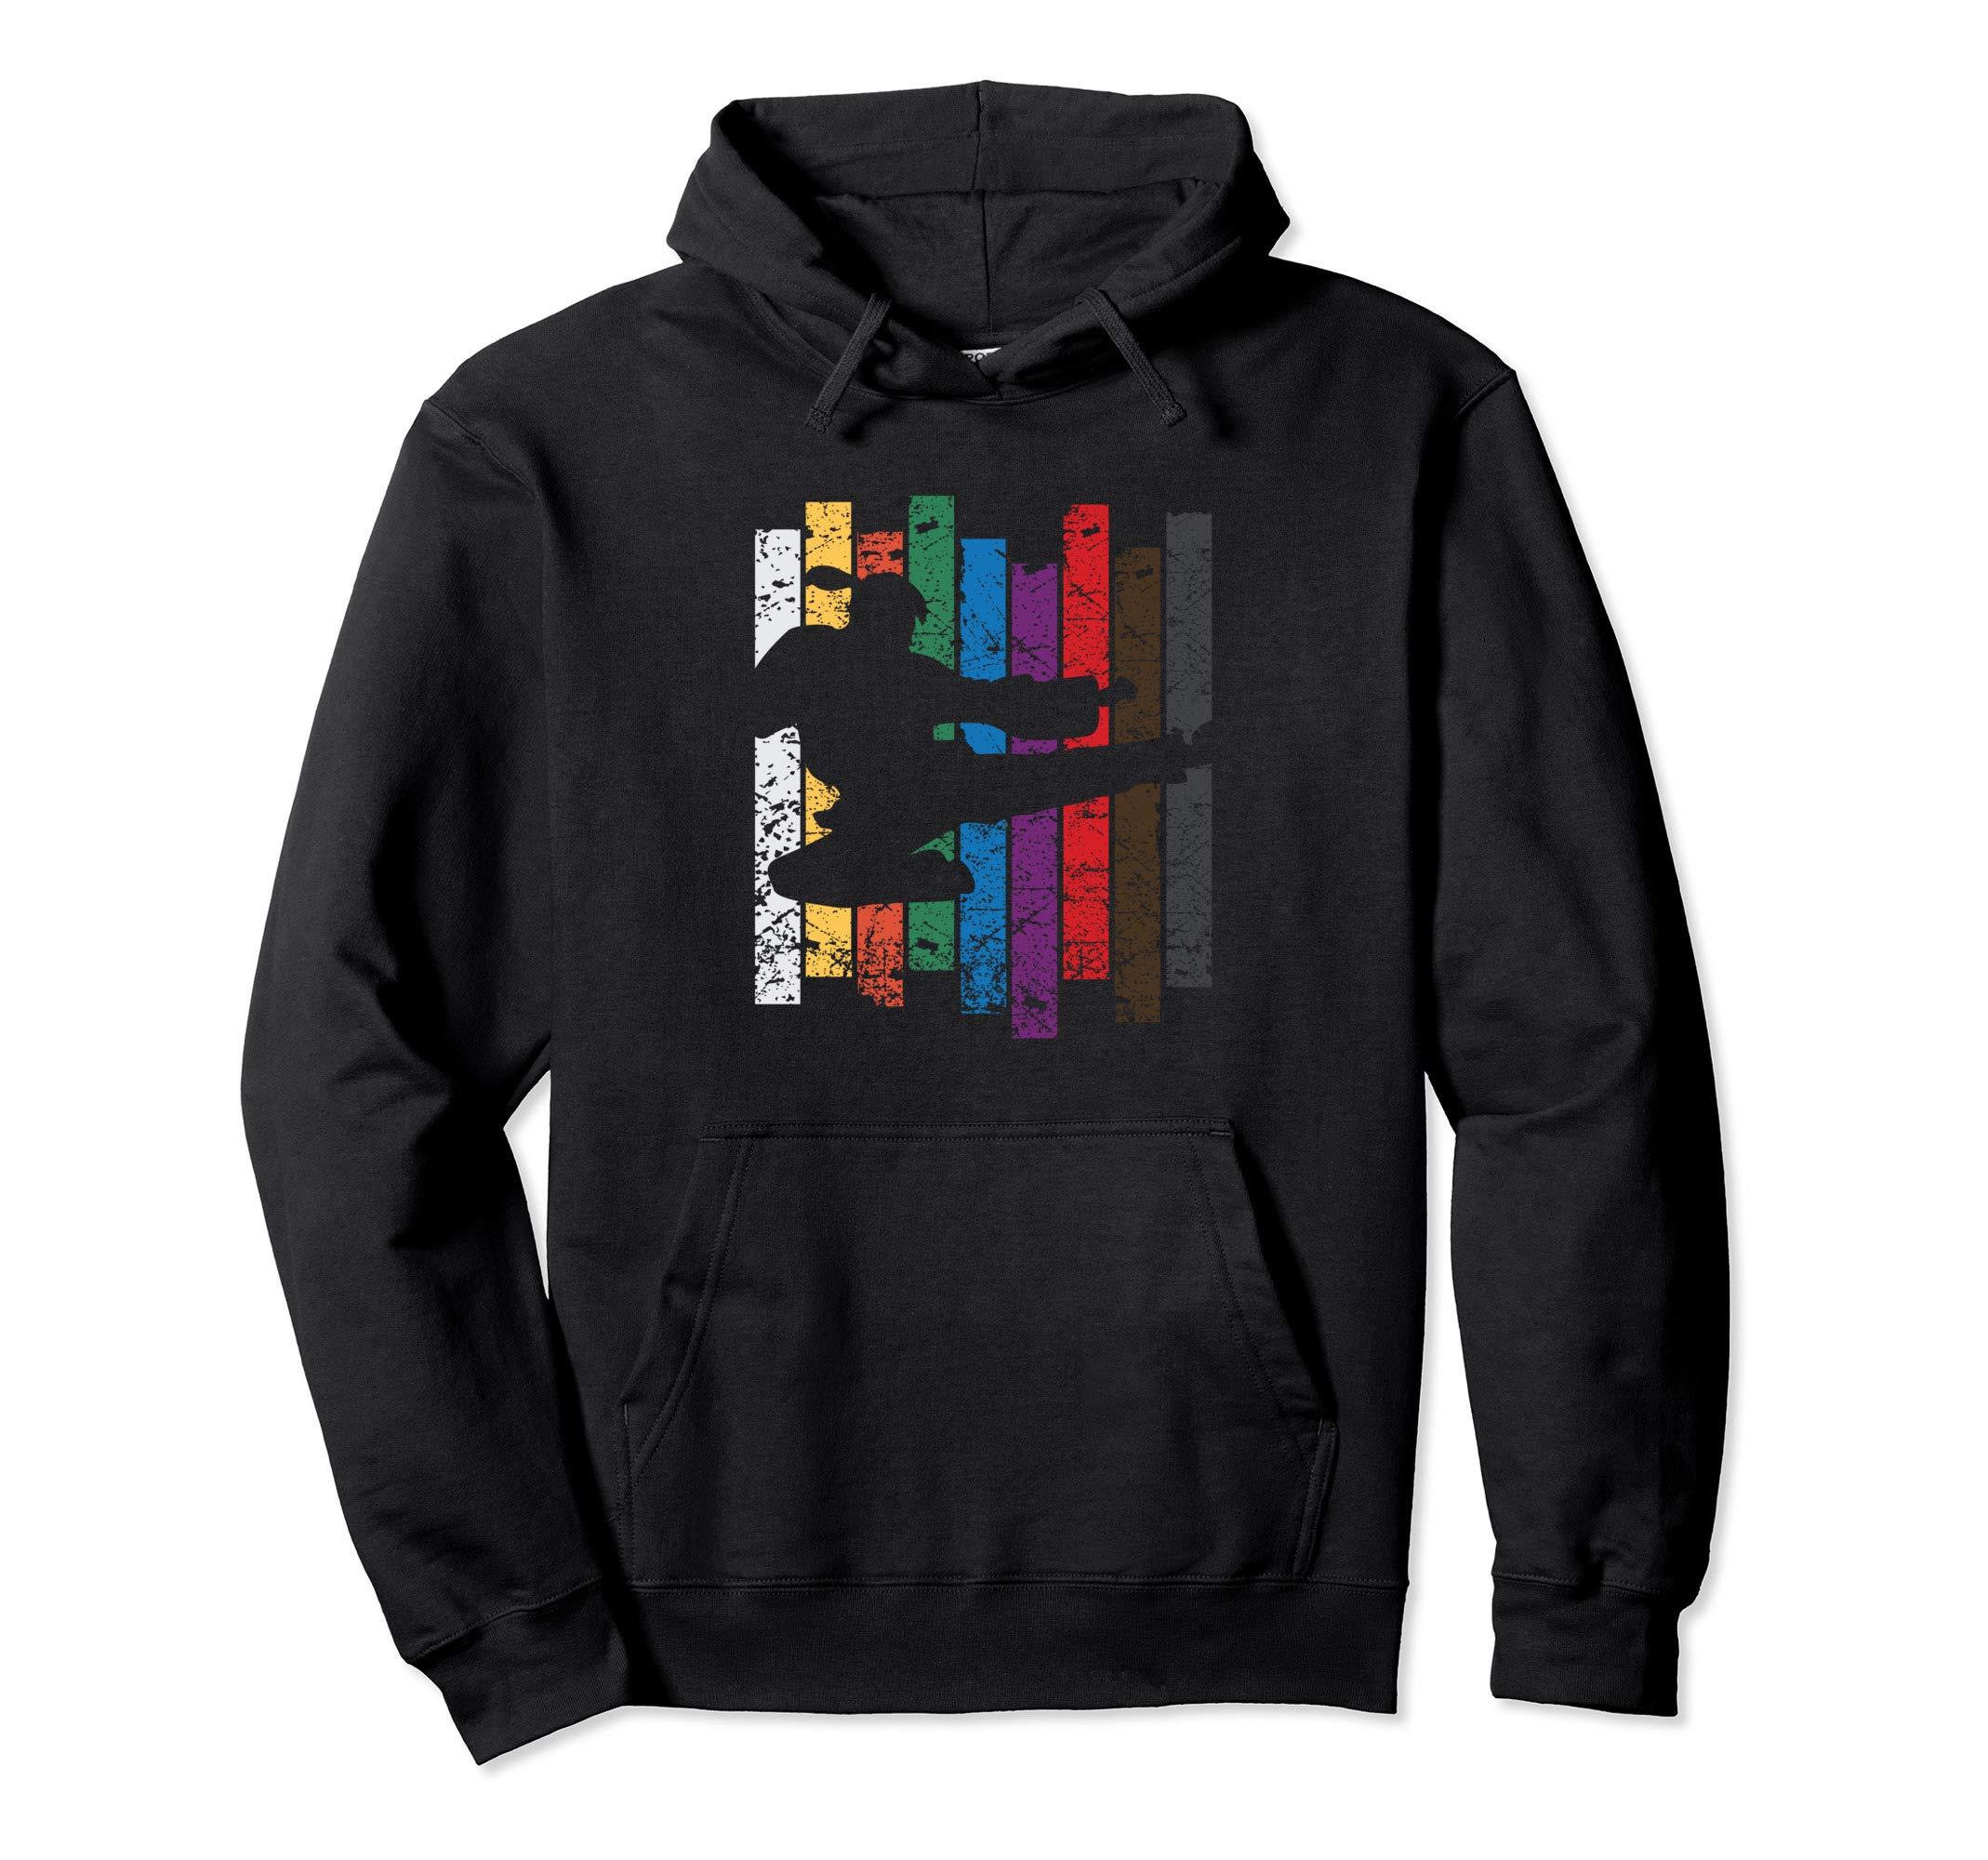 Taekwondo Kick Martial Art Rainbow Karate Pullover Hoodie by InGENIUS Taekwondo Shirts